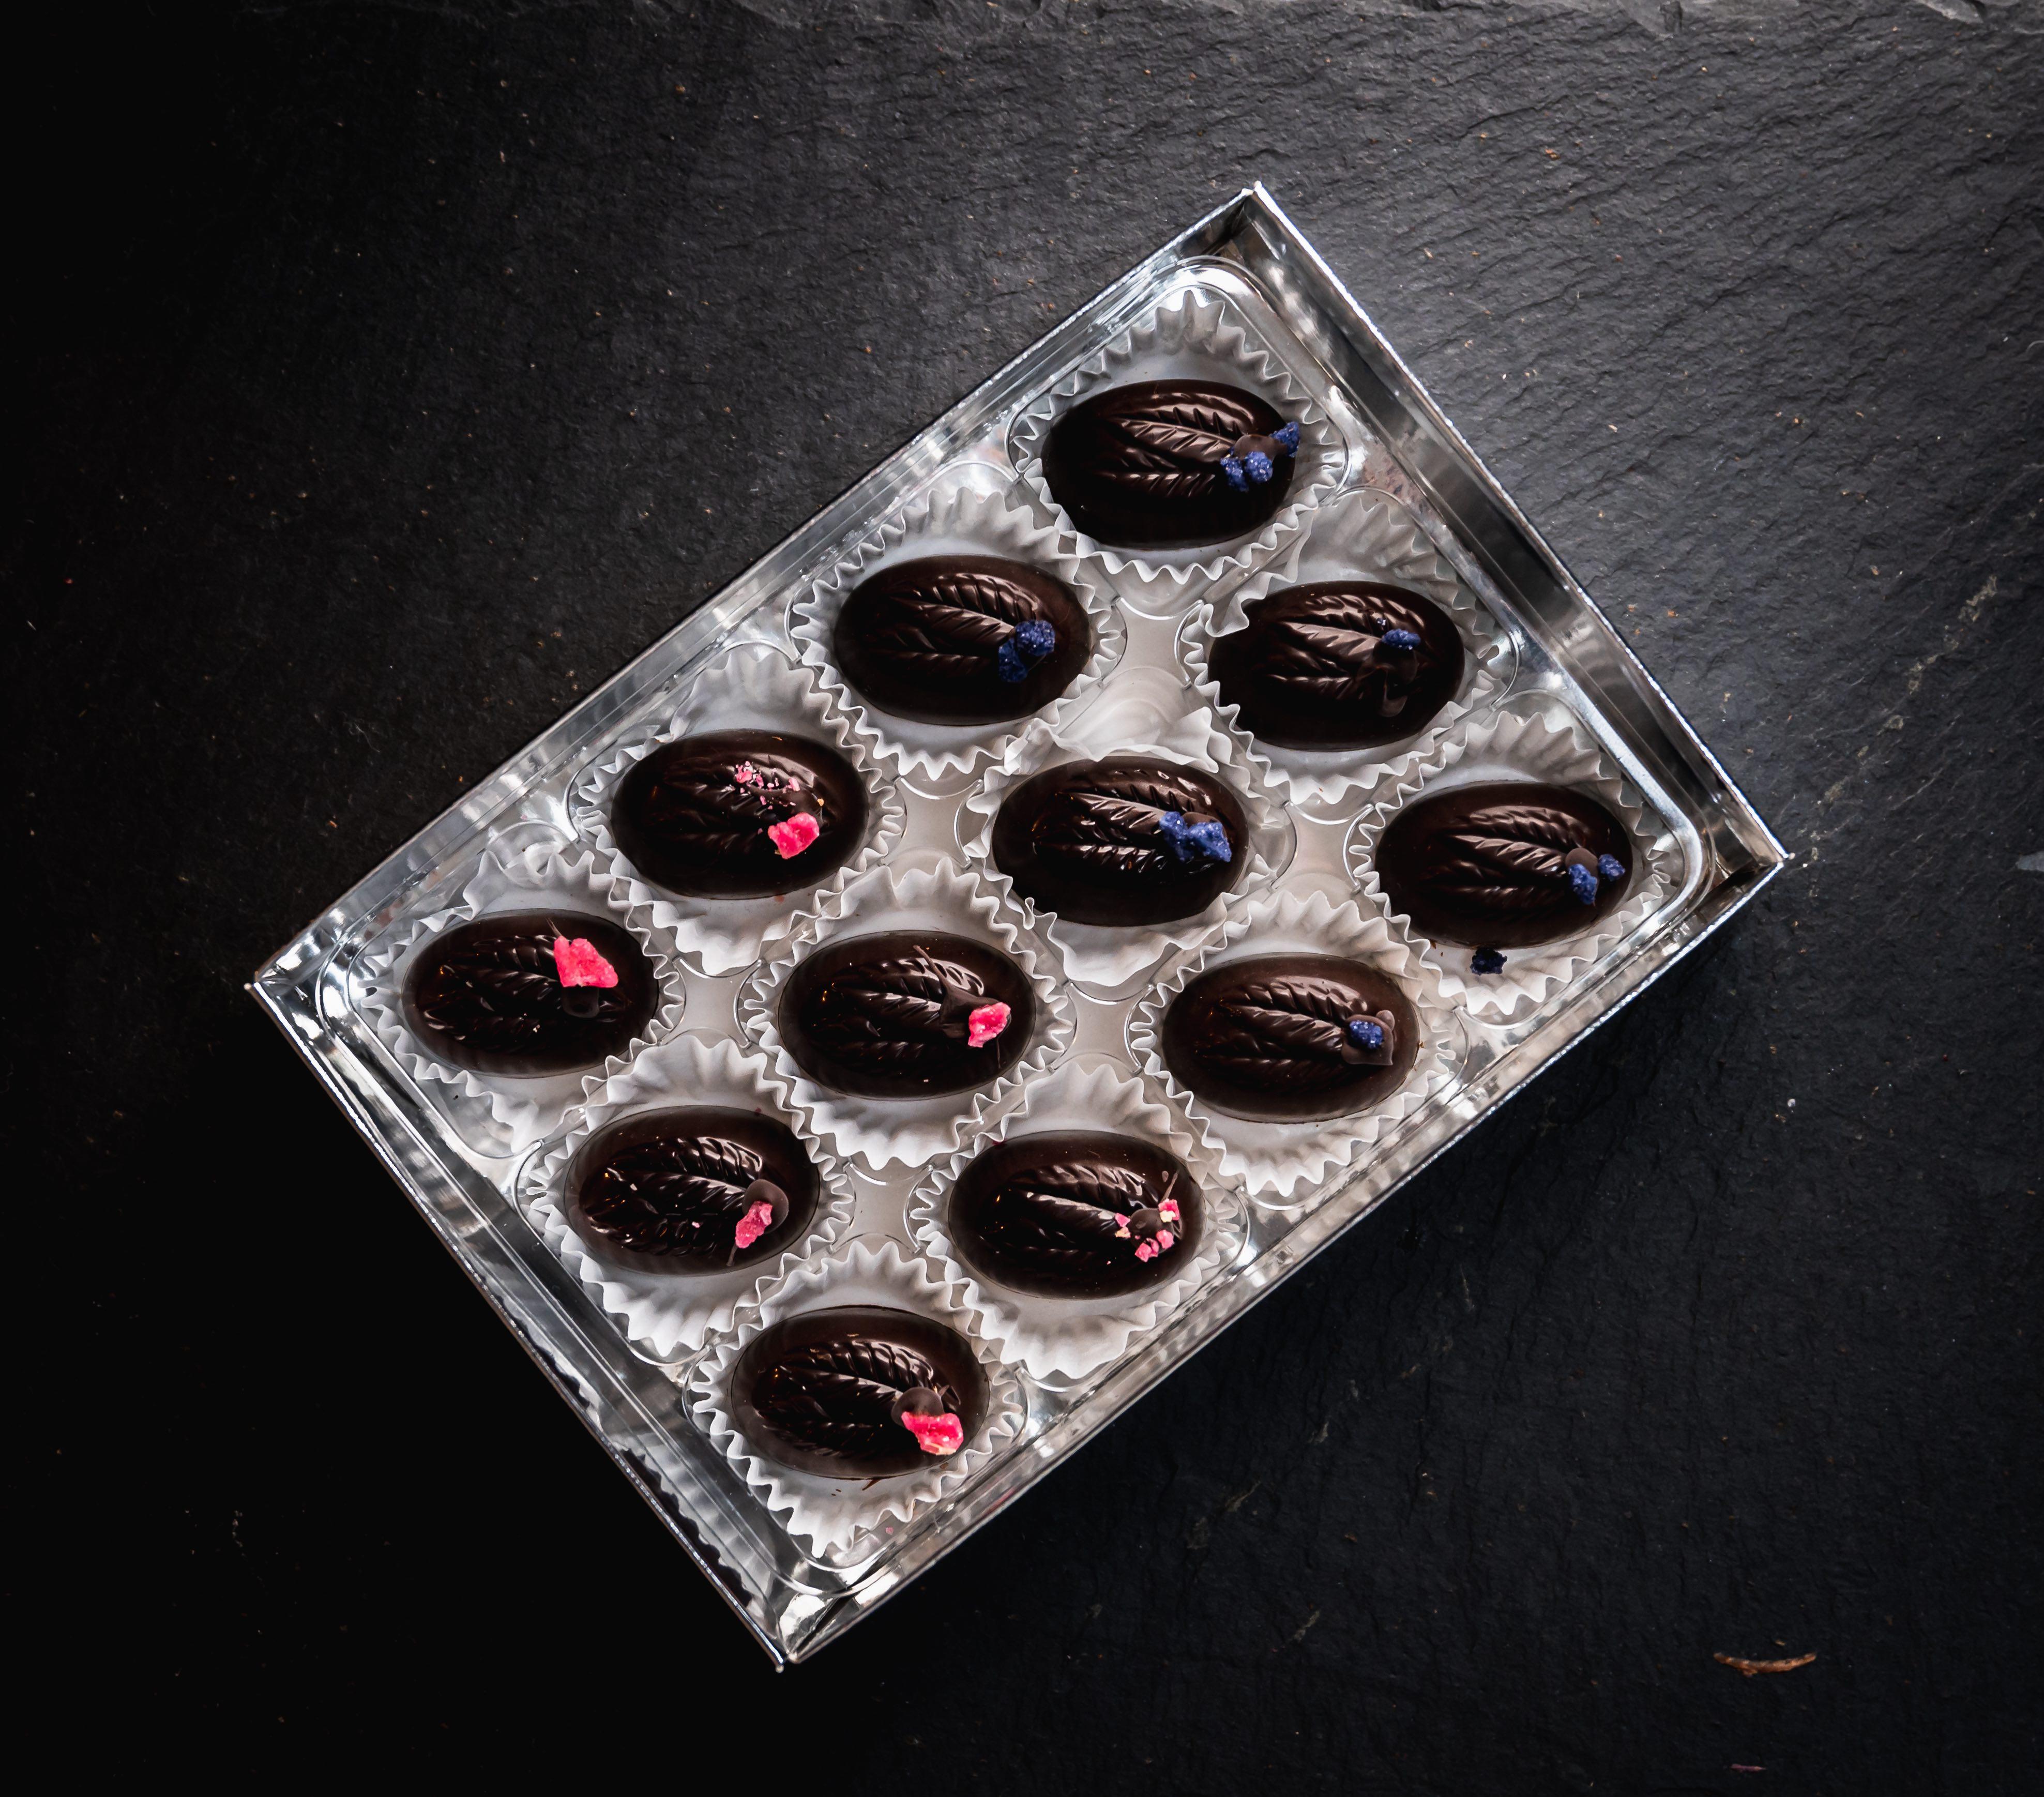 6 Rose and 6 Violet Fondant Creams in Dark Chocolate